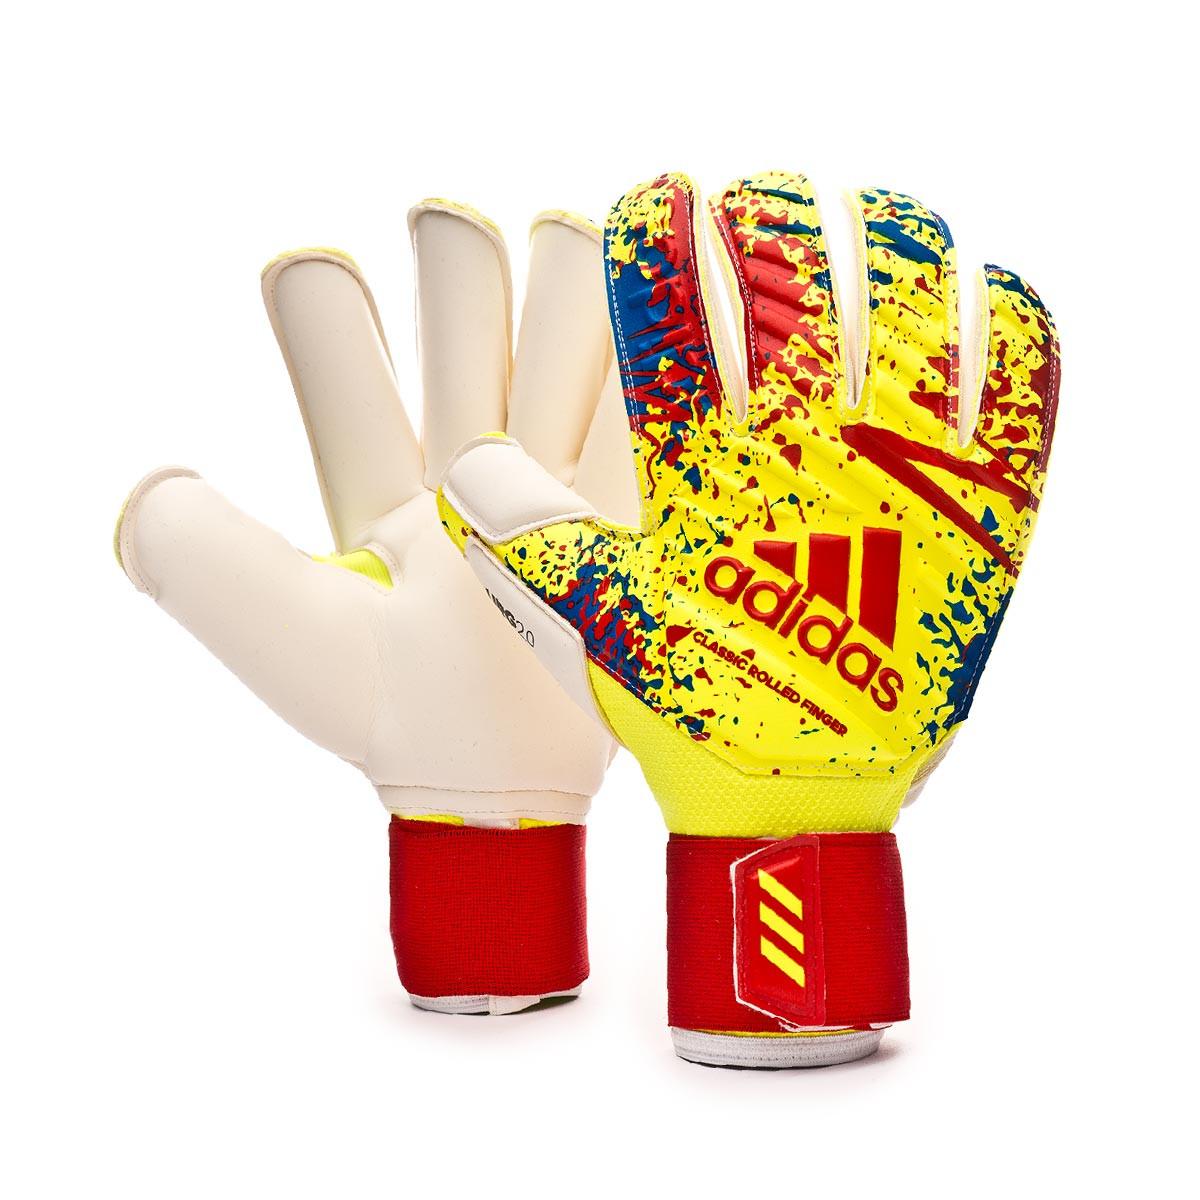 Resbaladizo Vástago Manto  Glove adidas Classic Pro GC Solar yellow-Active red-Football blue -  Football store Fútbol Emotion